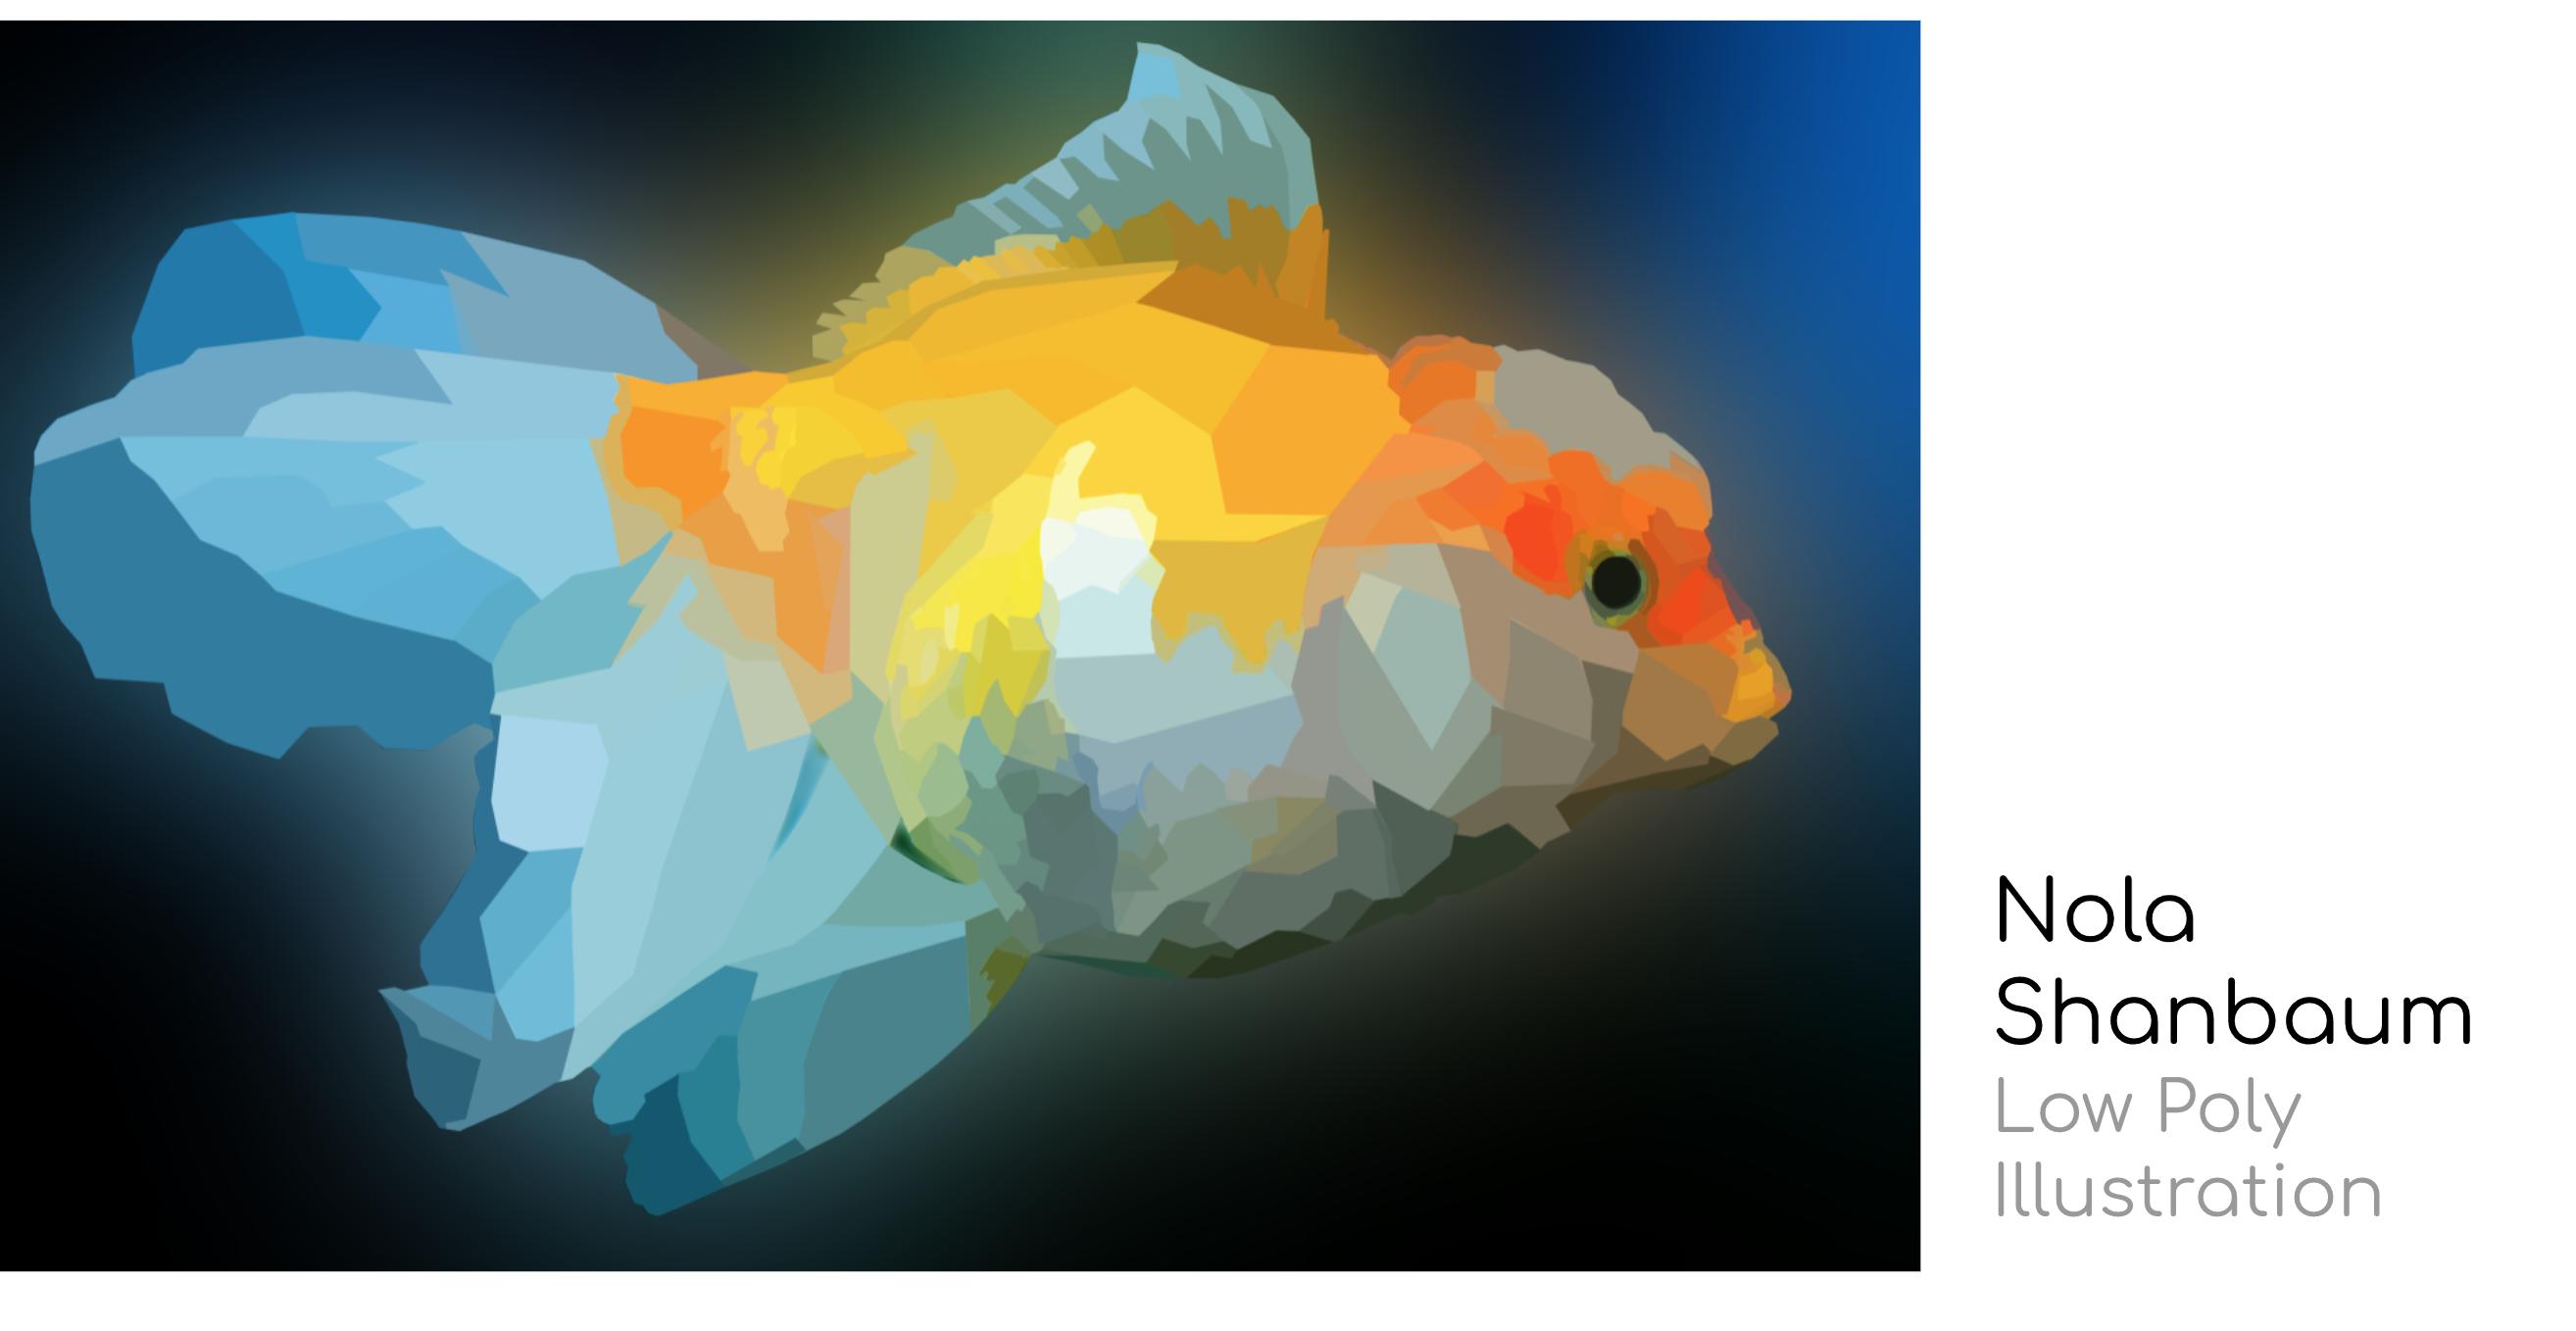 Student art - Low Poly Illustration by Nola Shanbaum